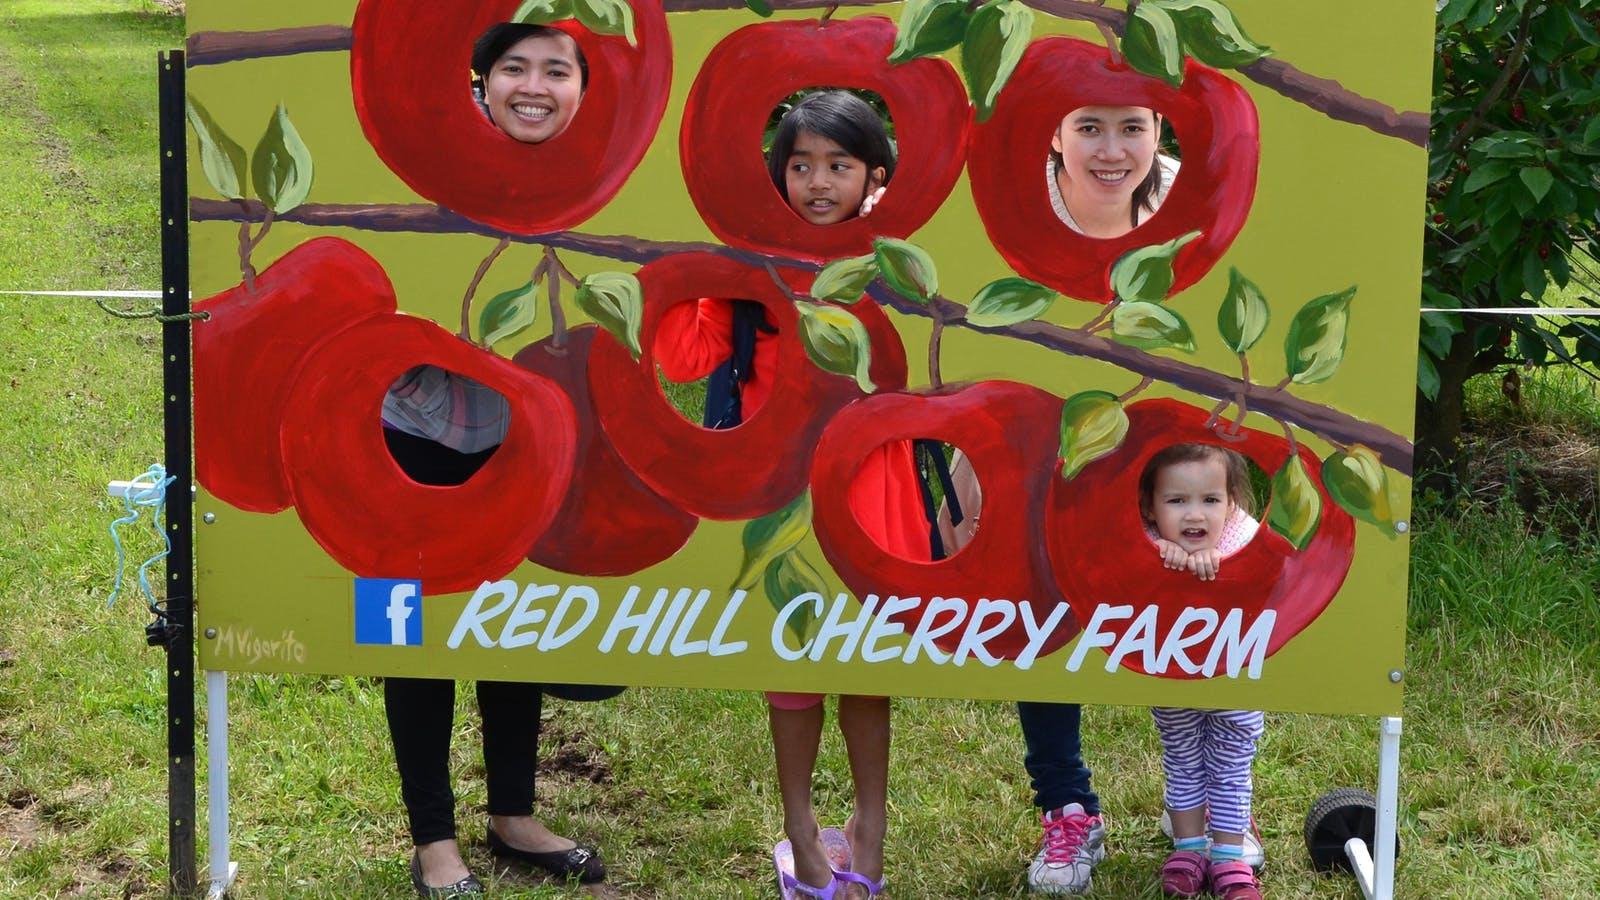 Red Hill Cherry Farm